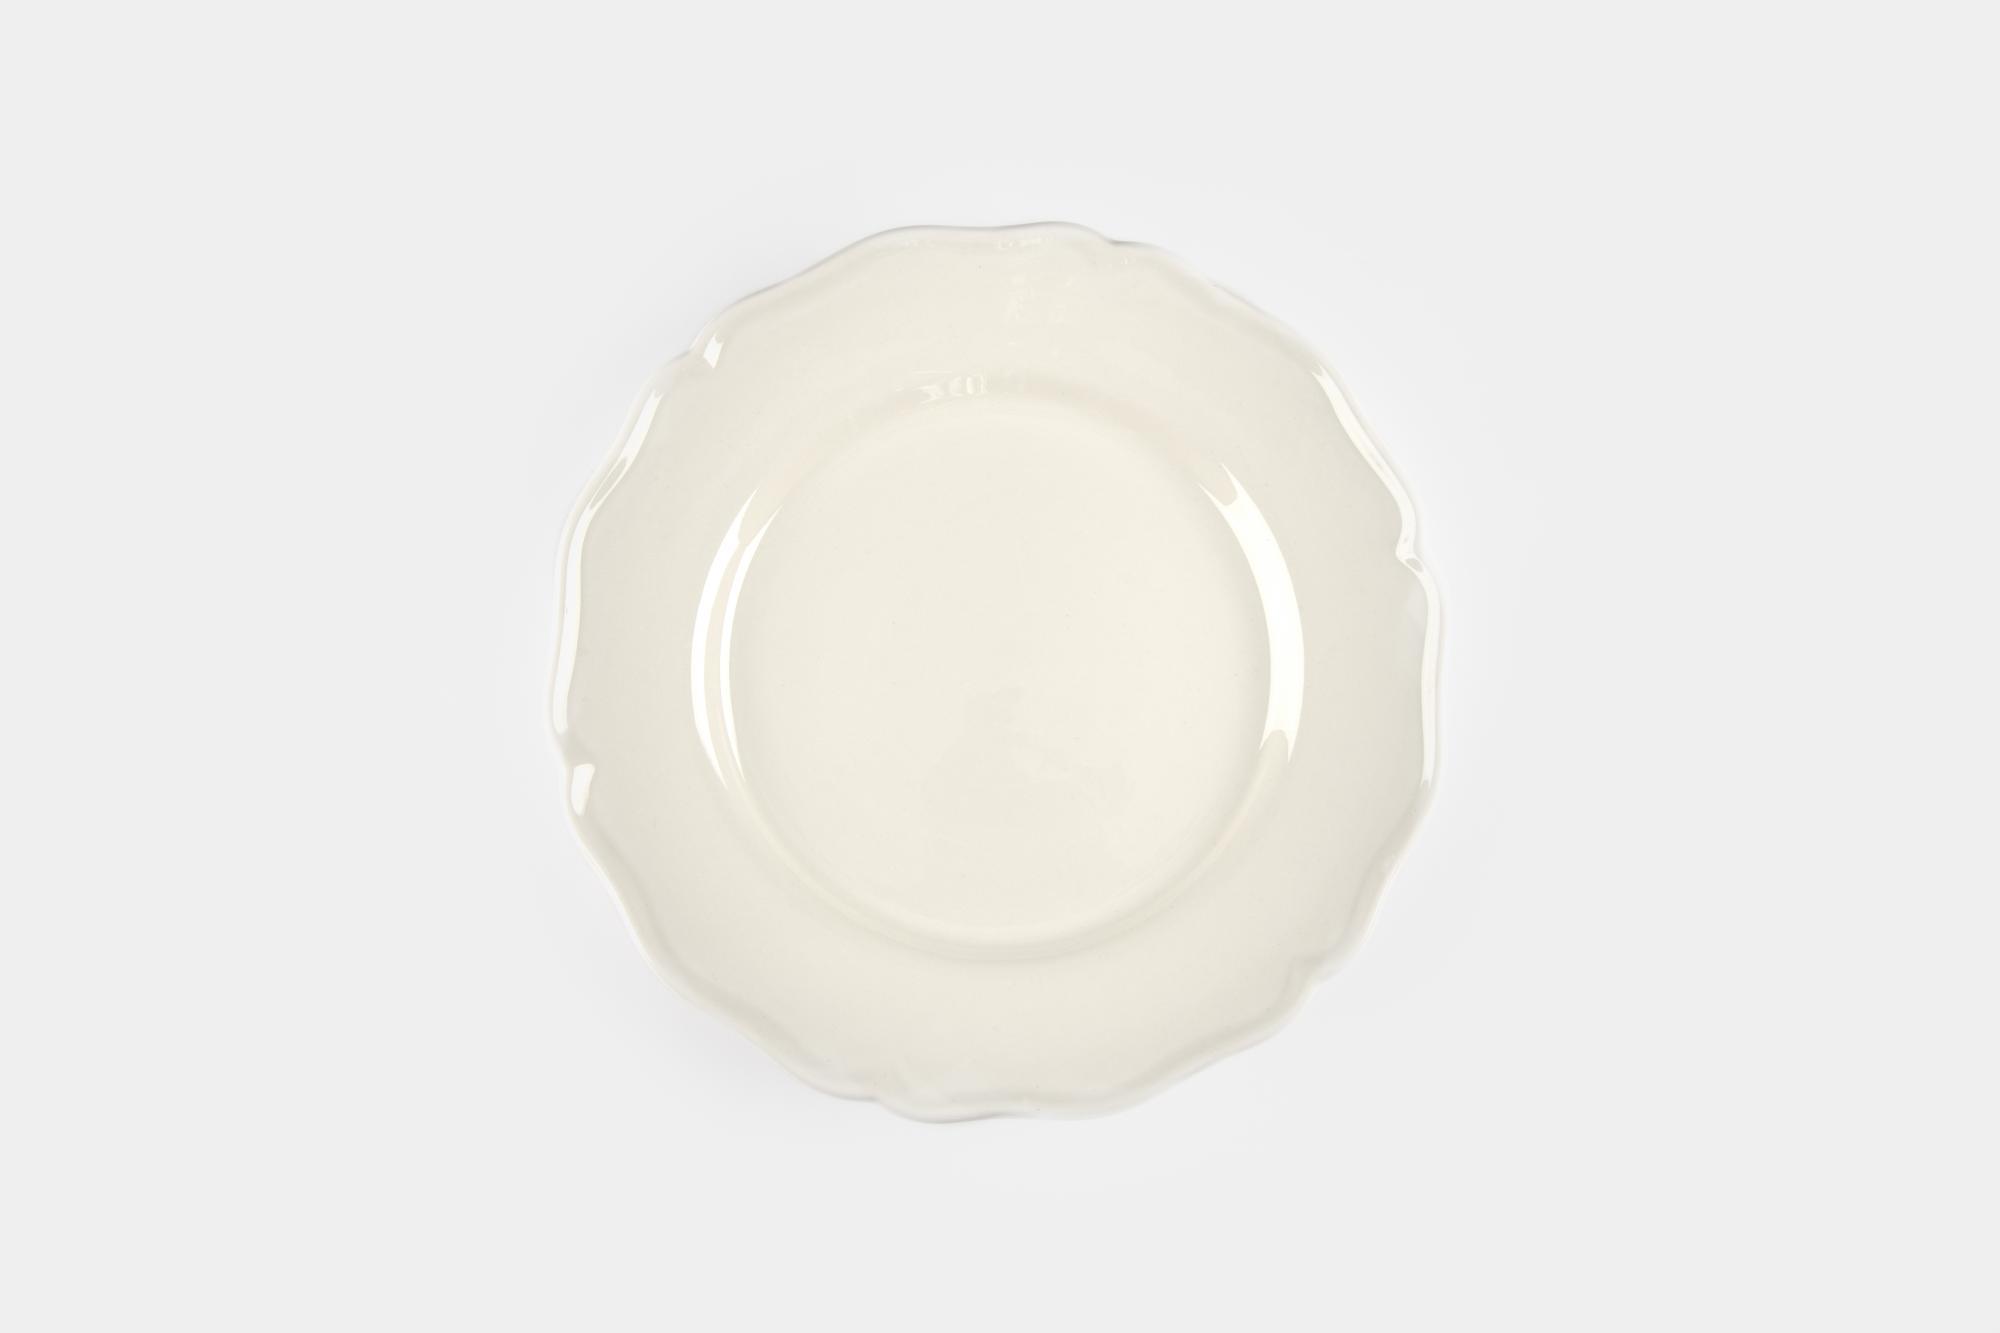 Bristol plate set - Image 0